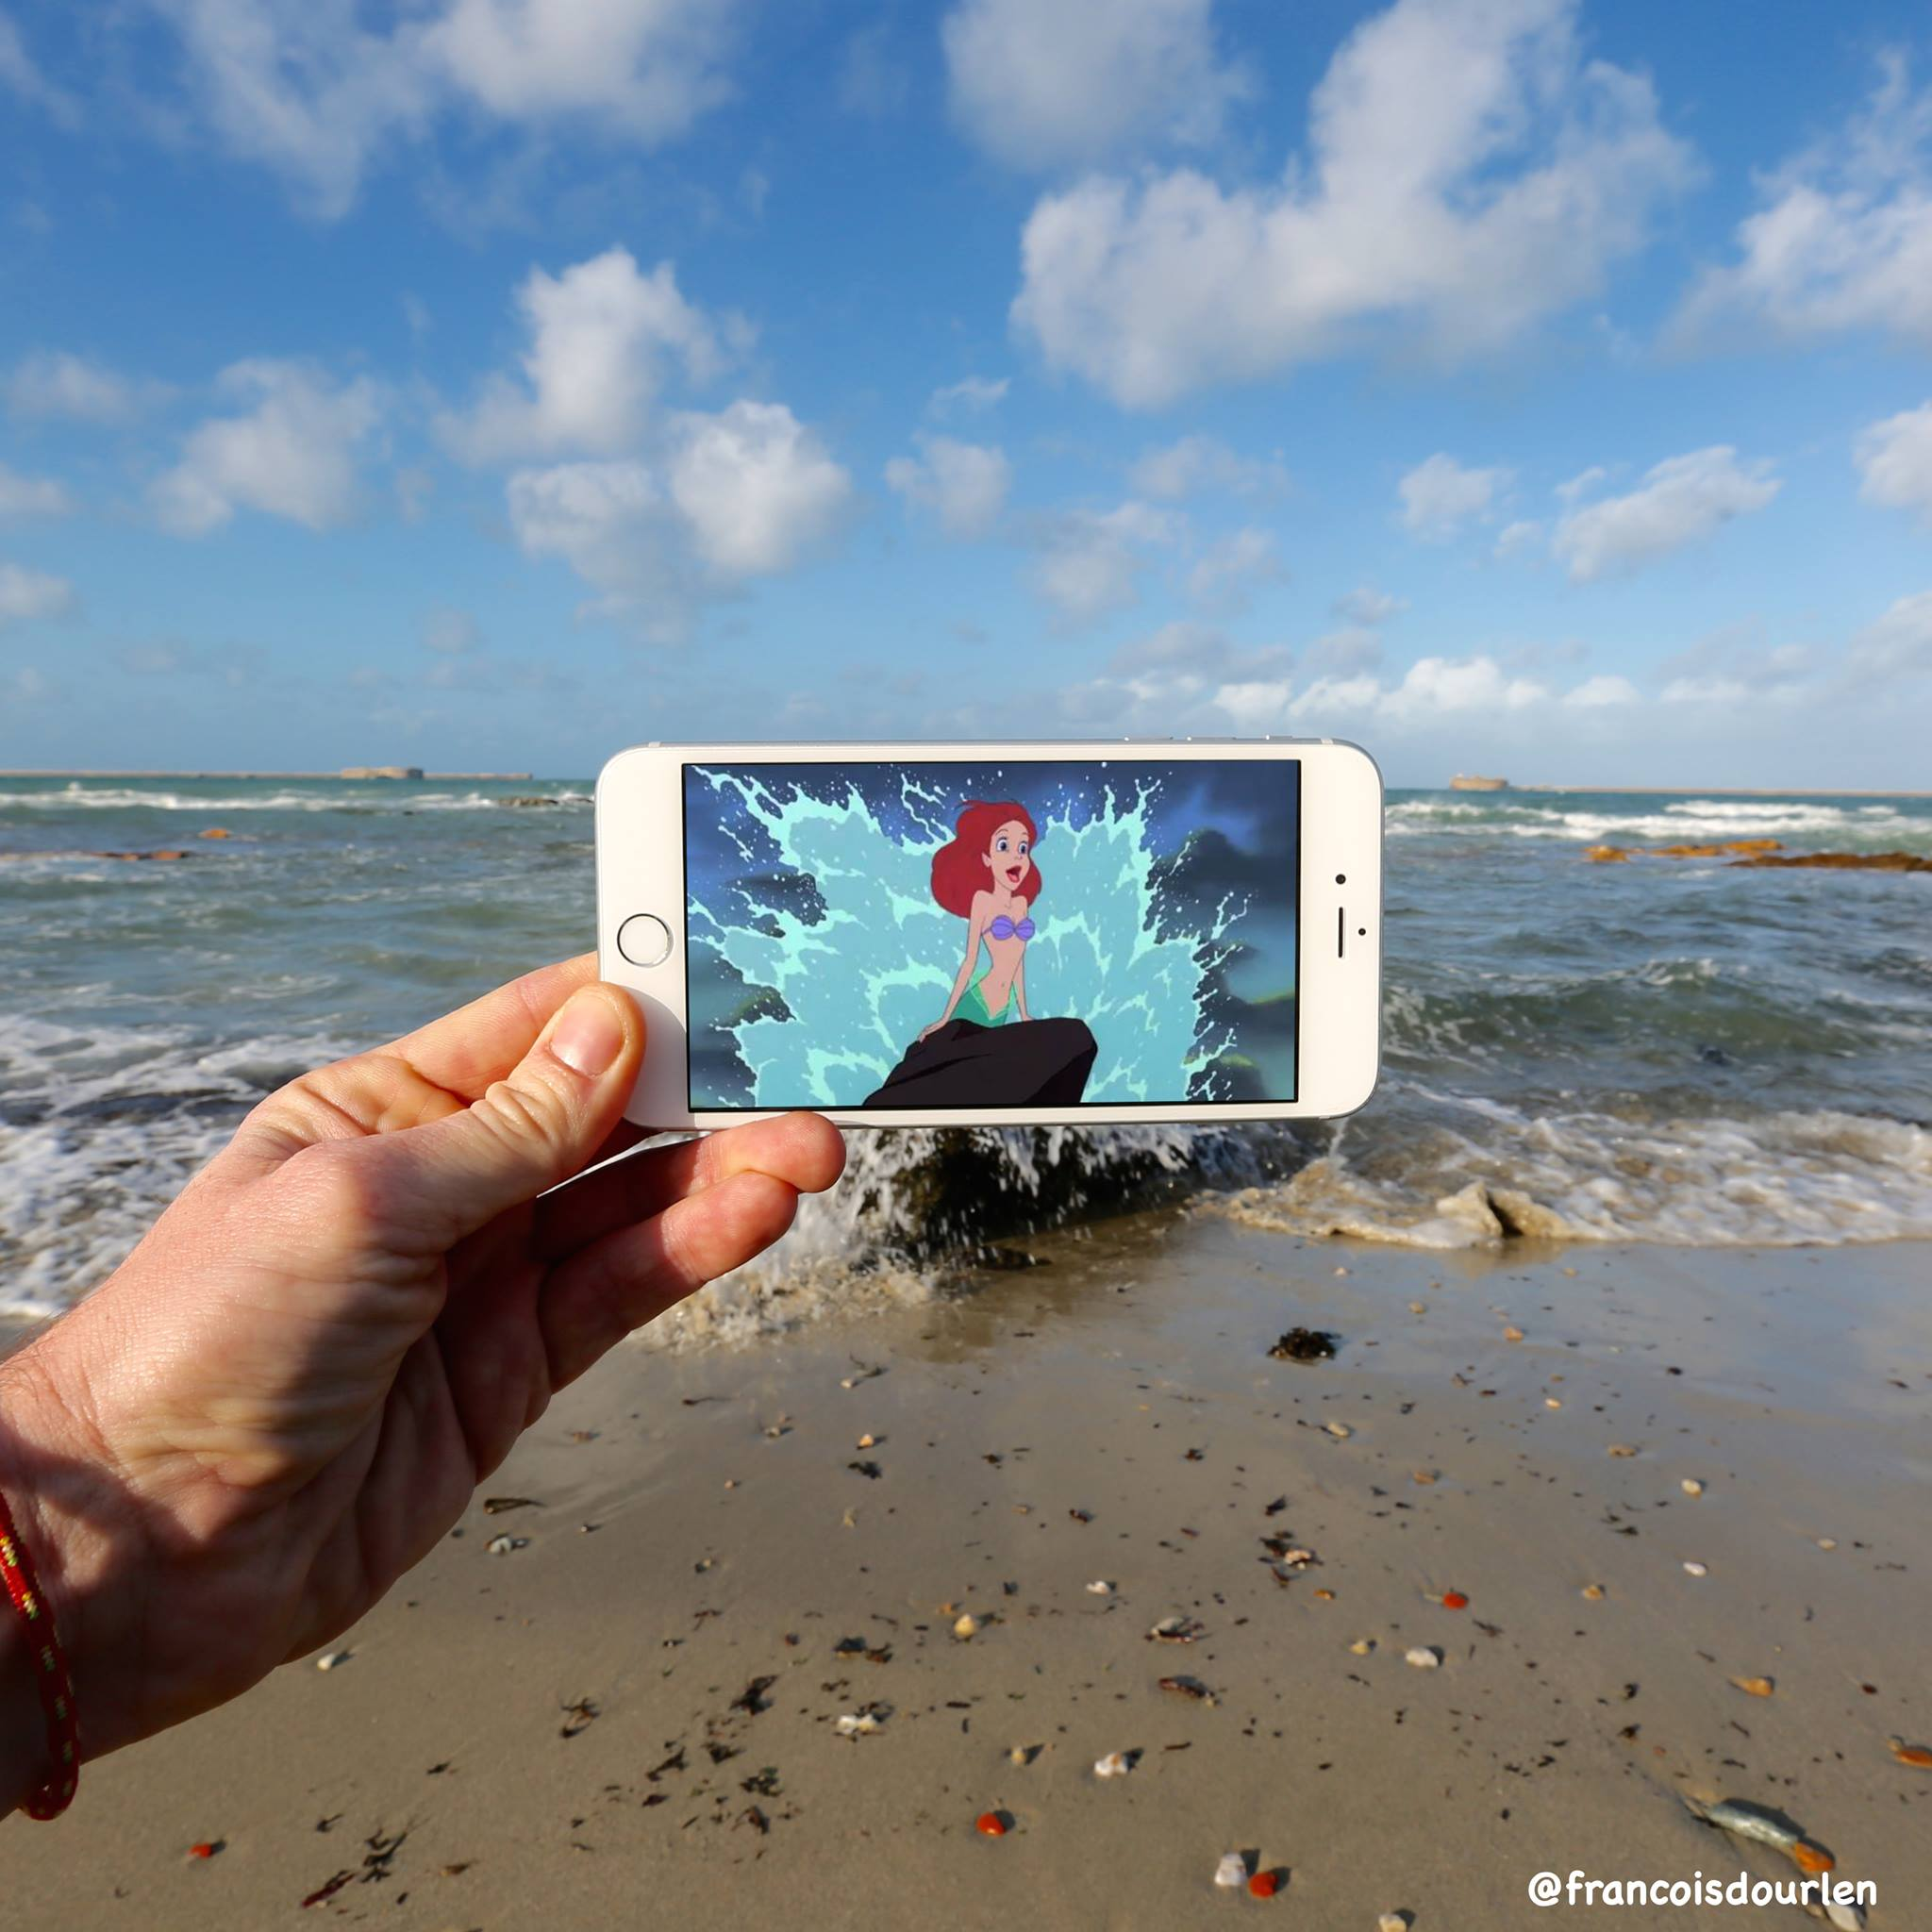 126337066078933226846915459142553193656244ojpg - - François Dourlen - </br> L'illusionniste au smartphone